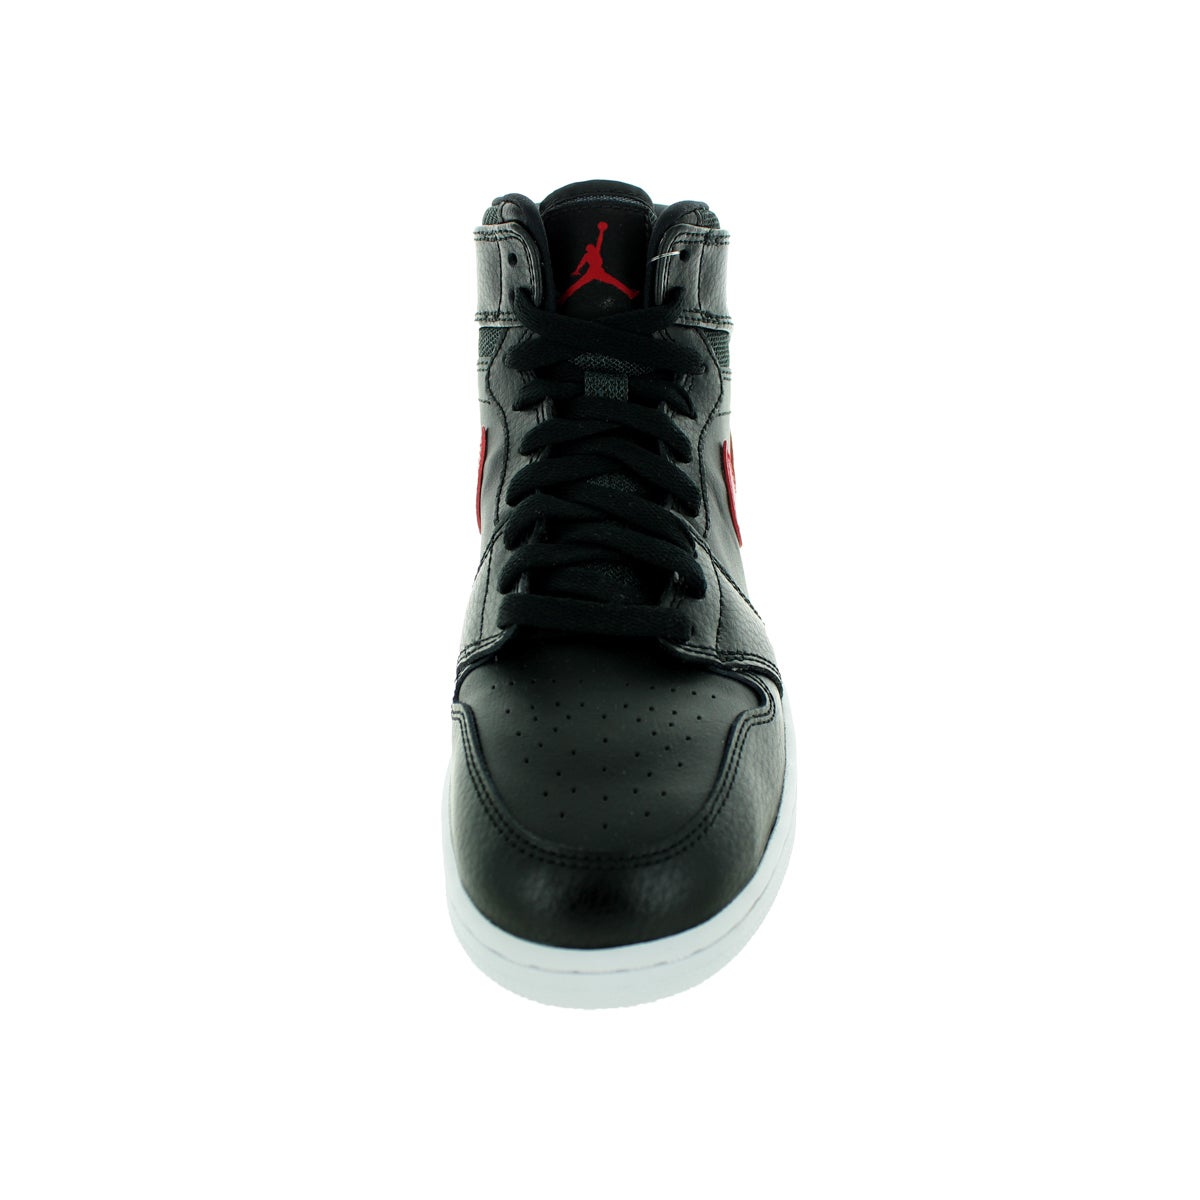 new concept 21bf7 de330 Shop Nike Jordan Kid s Air Jordan 1 Retro High Bg Black Gym Red Black White  Basketball Shoe - Free Shipping Today - Overstock - 12322188